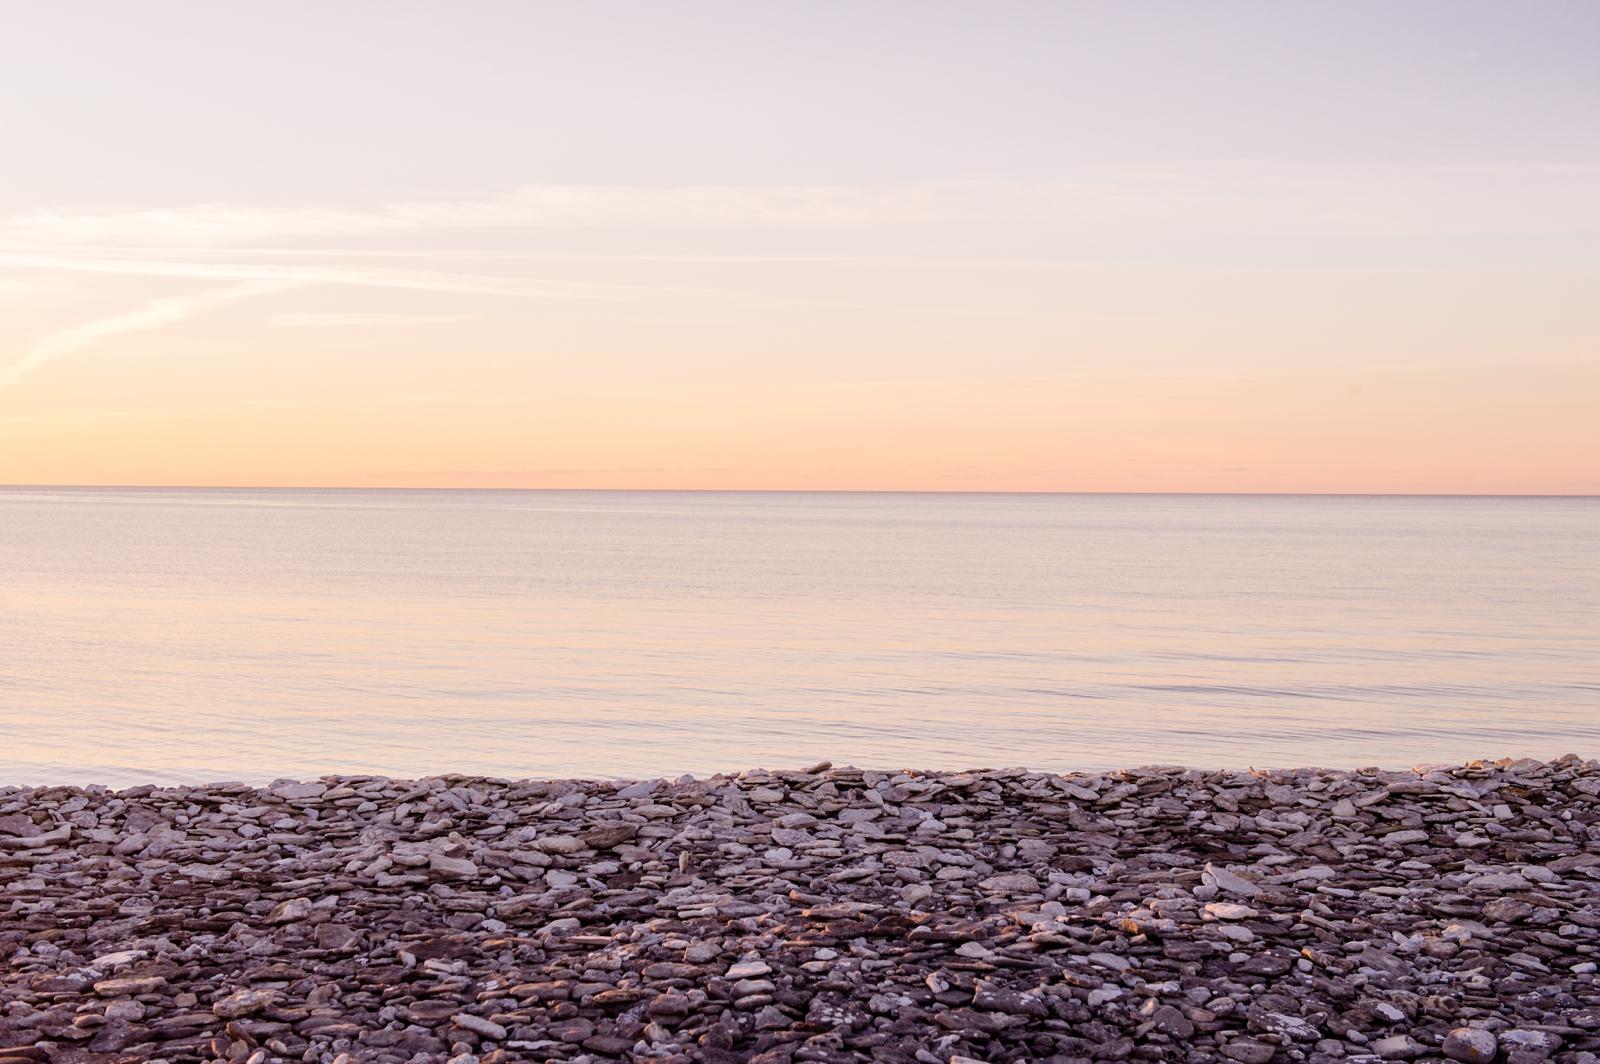 Peddle beach sunset